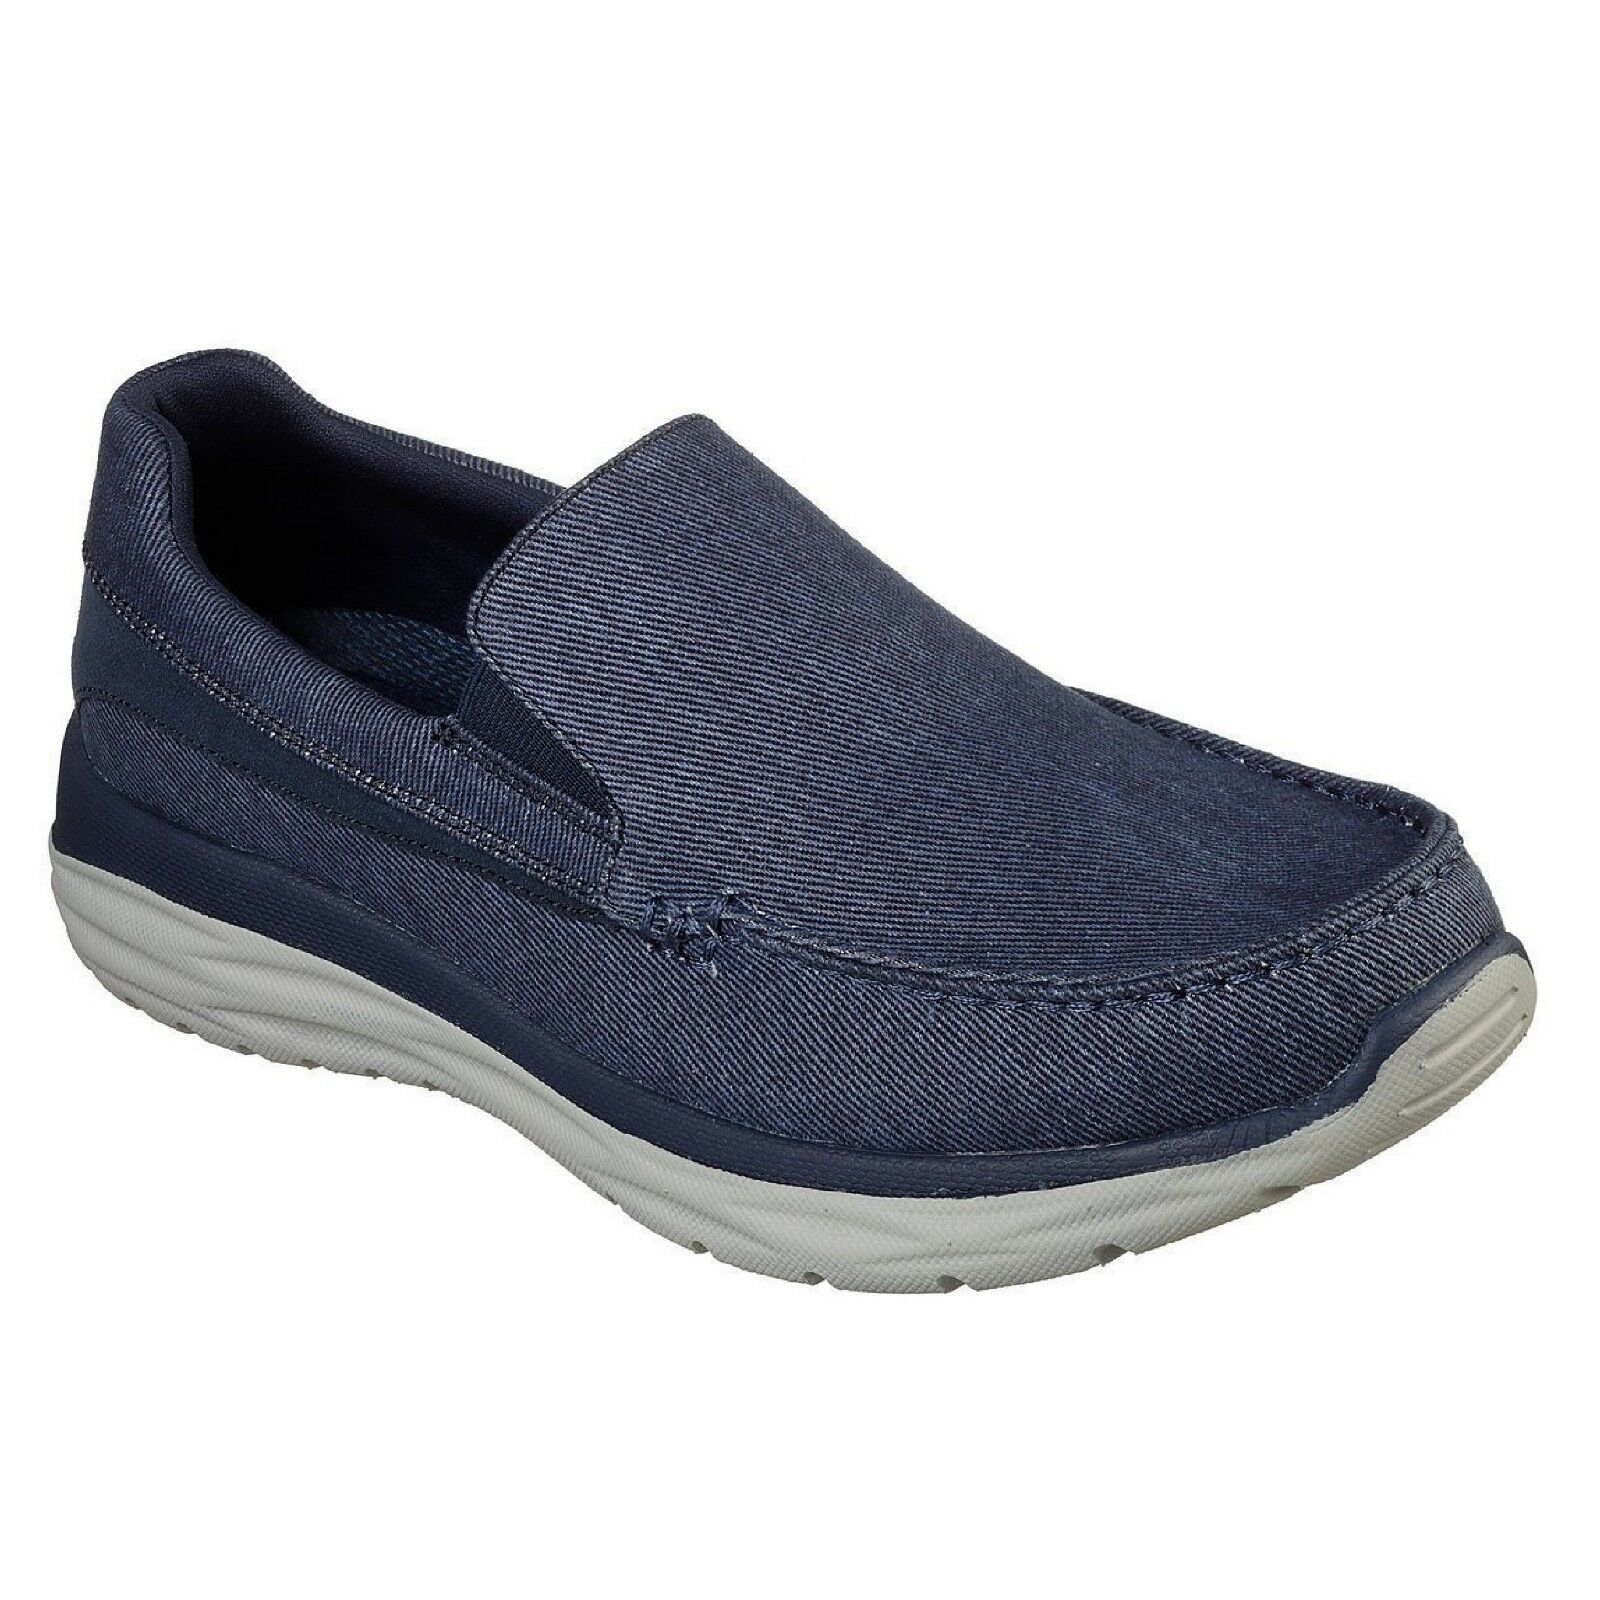 65605 blue Skechers, Men's Harsen-Alondro Loafer shoes